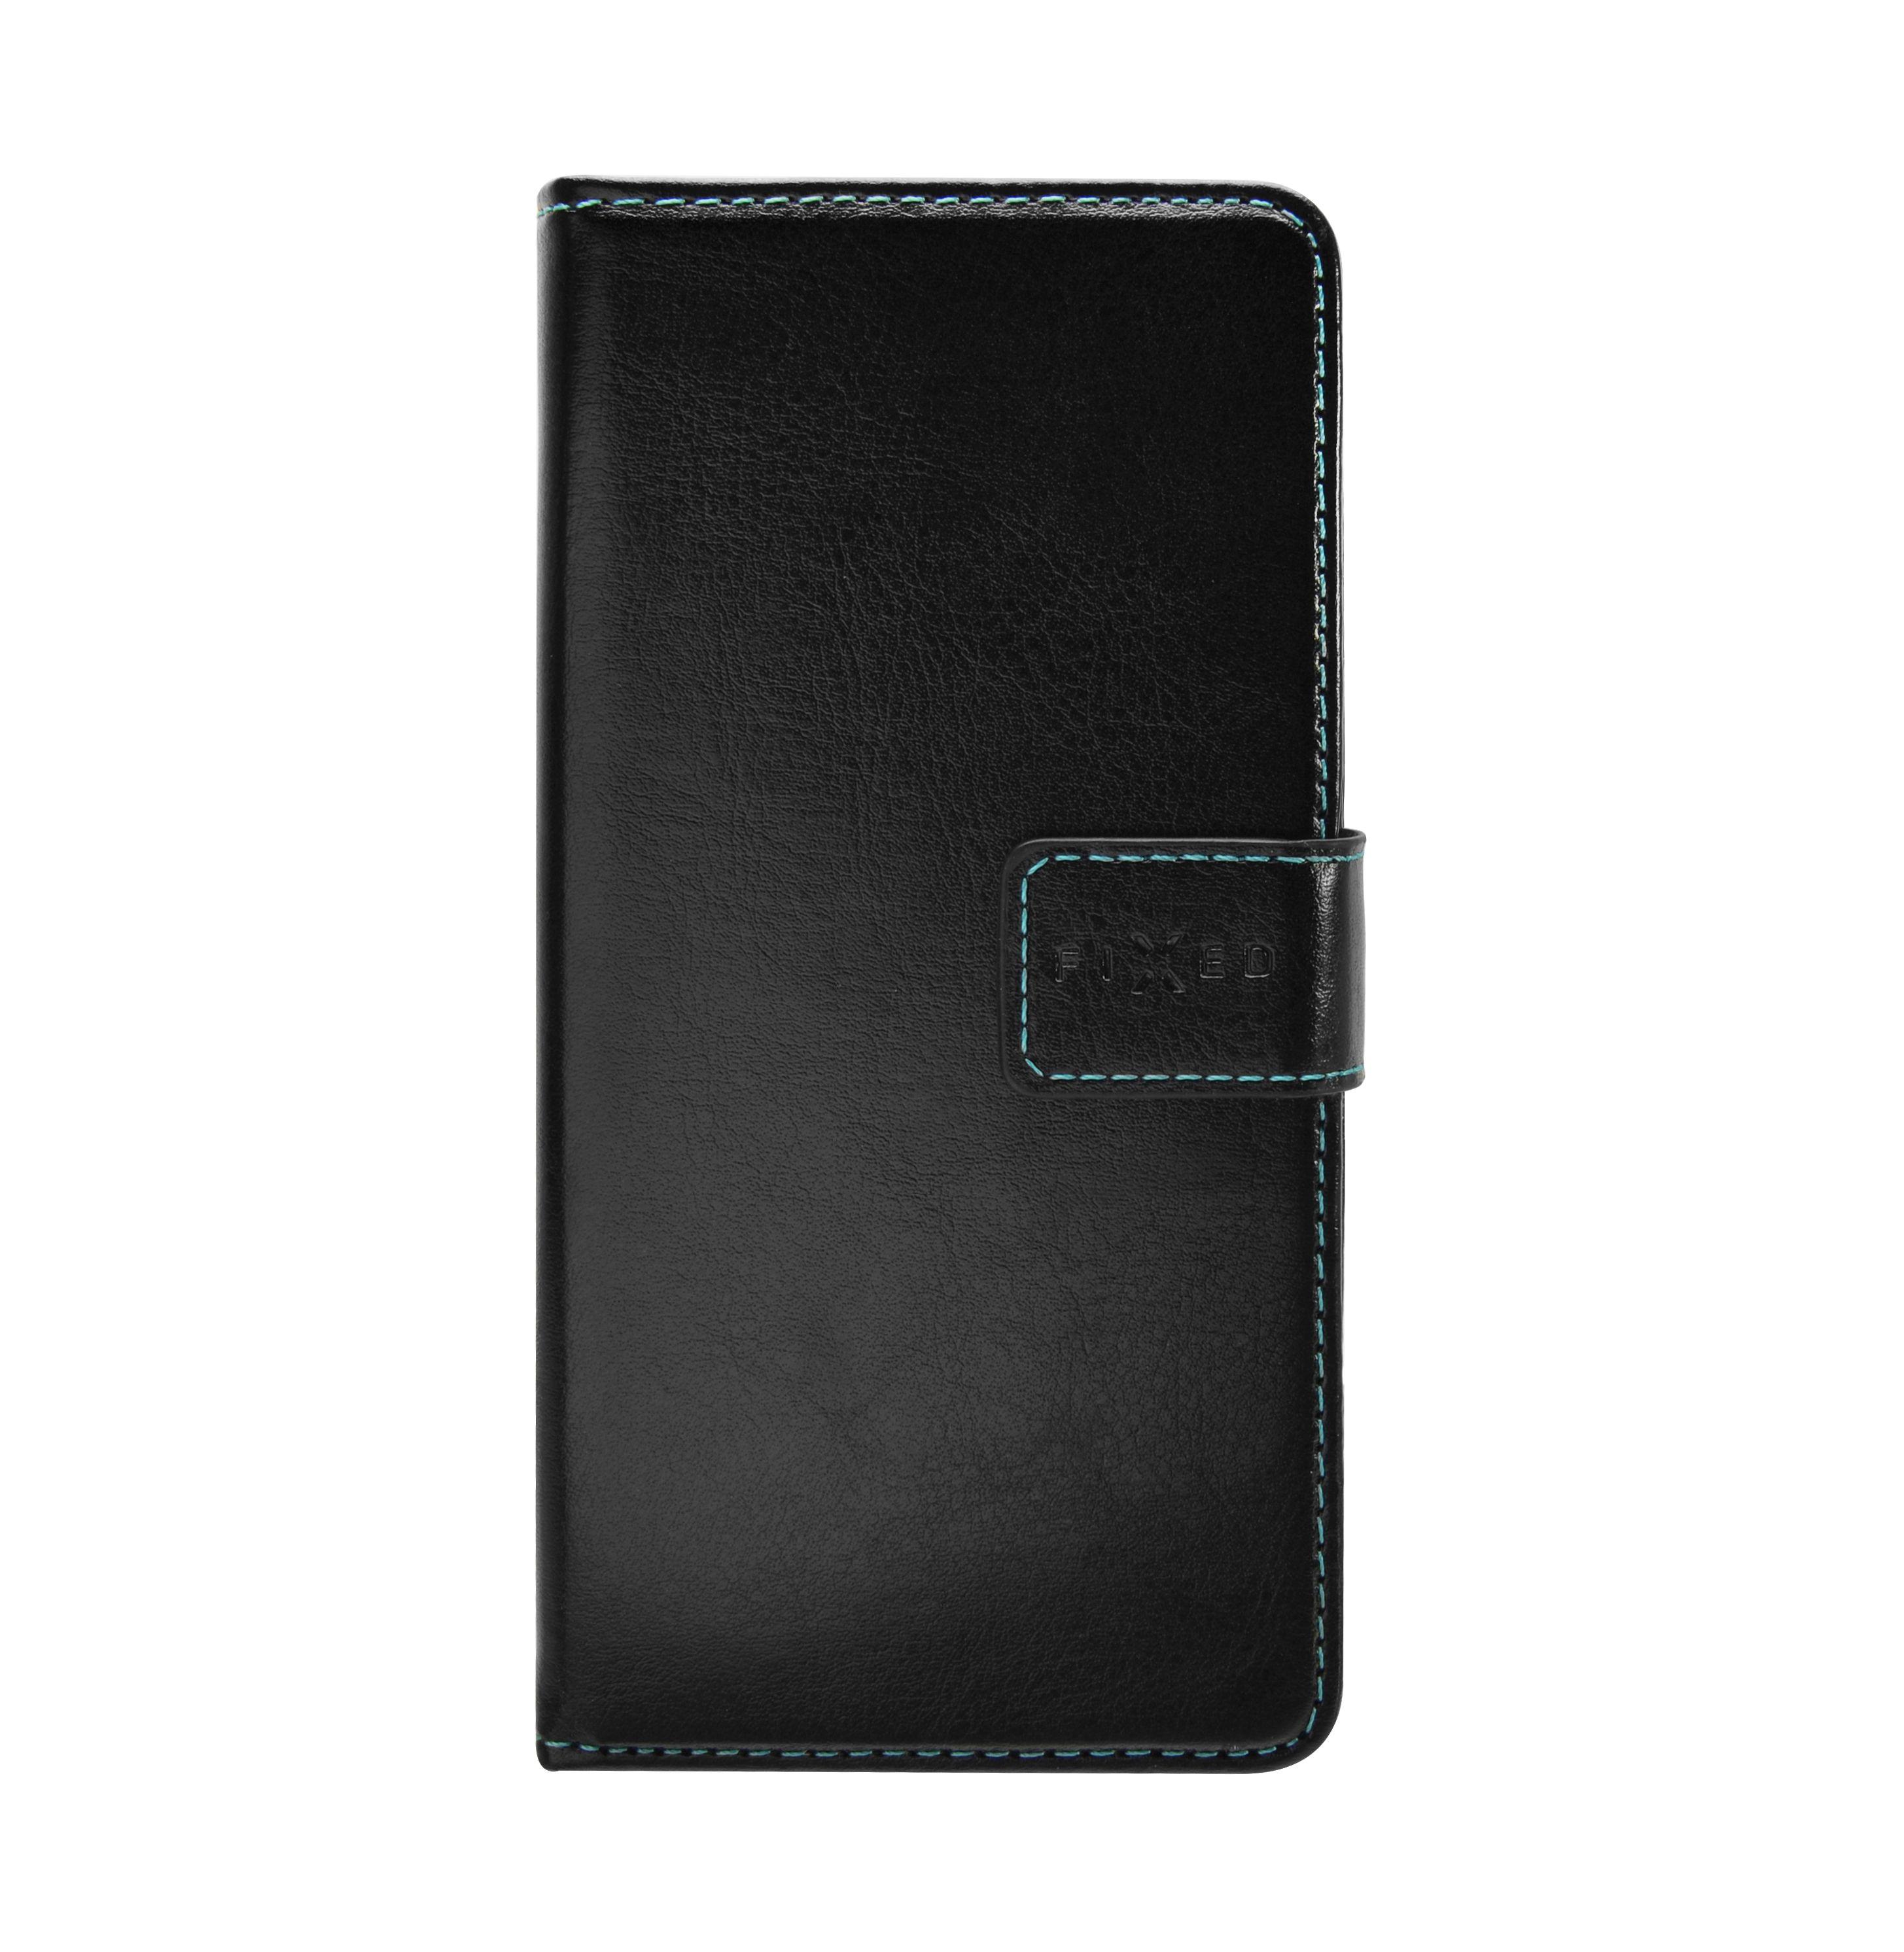 Pouzdro typu kniha FIXED Opus pro Xiaomi Redmi 7A, černé